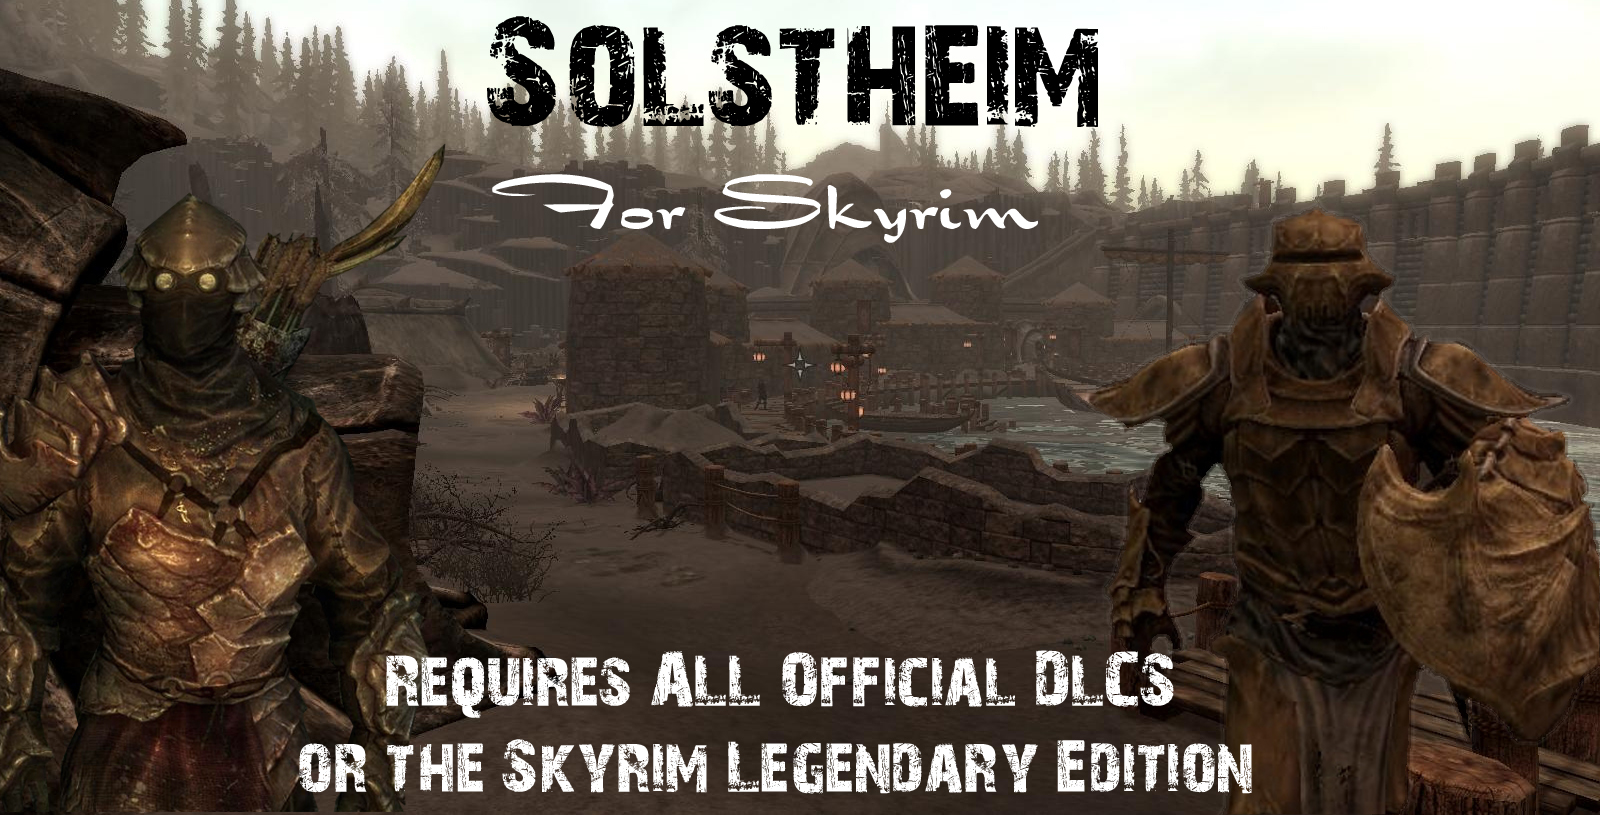 Solstheim V26 mod for Elder Scrolls V Skyrim  Mod DB